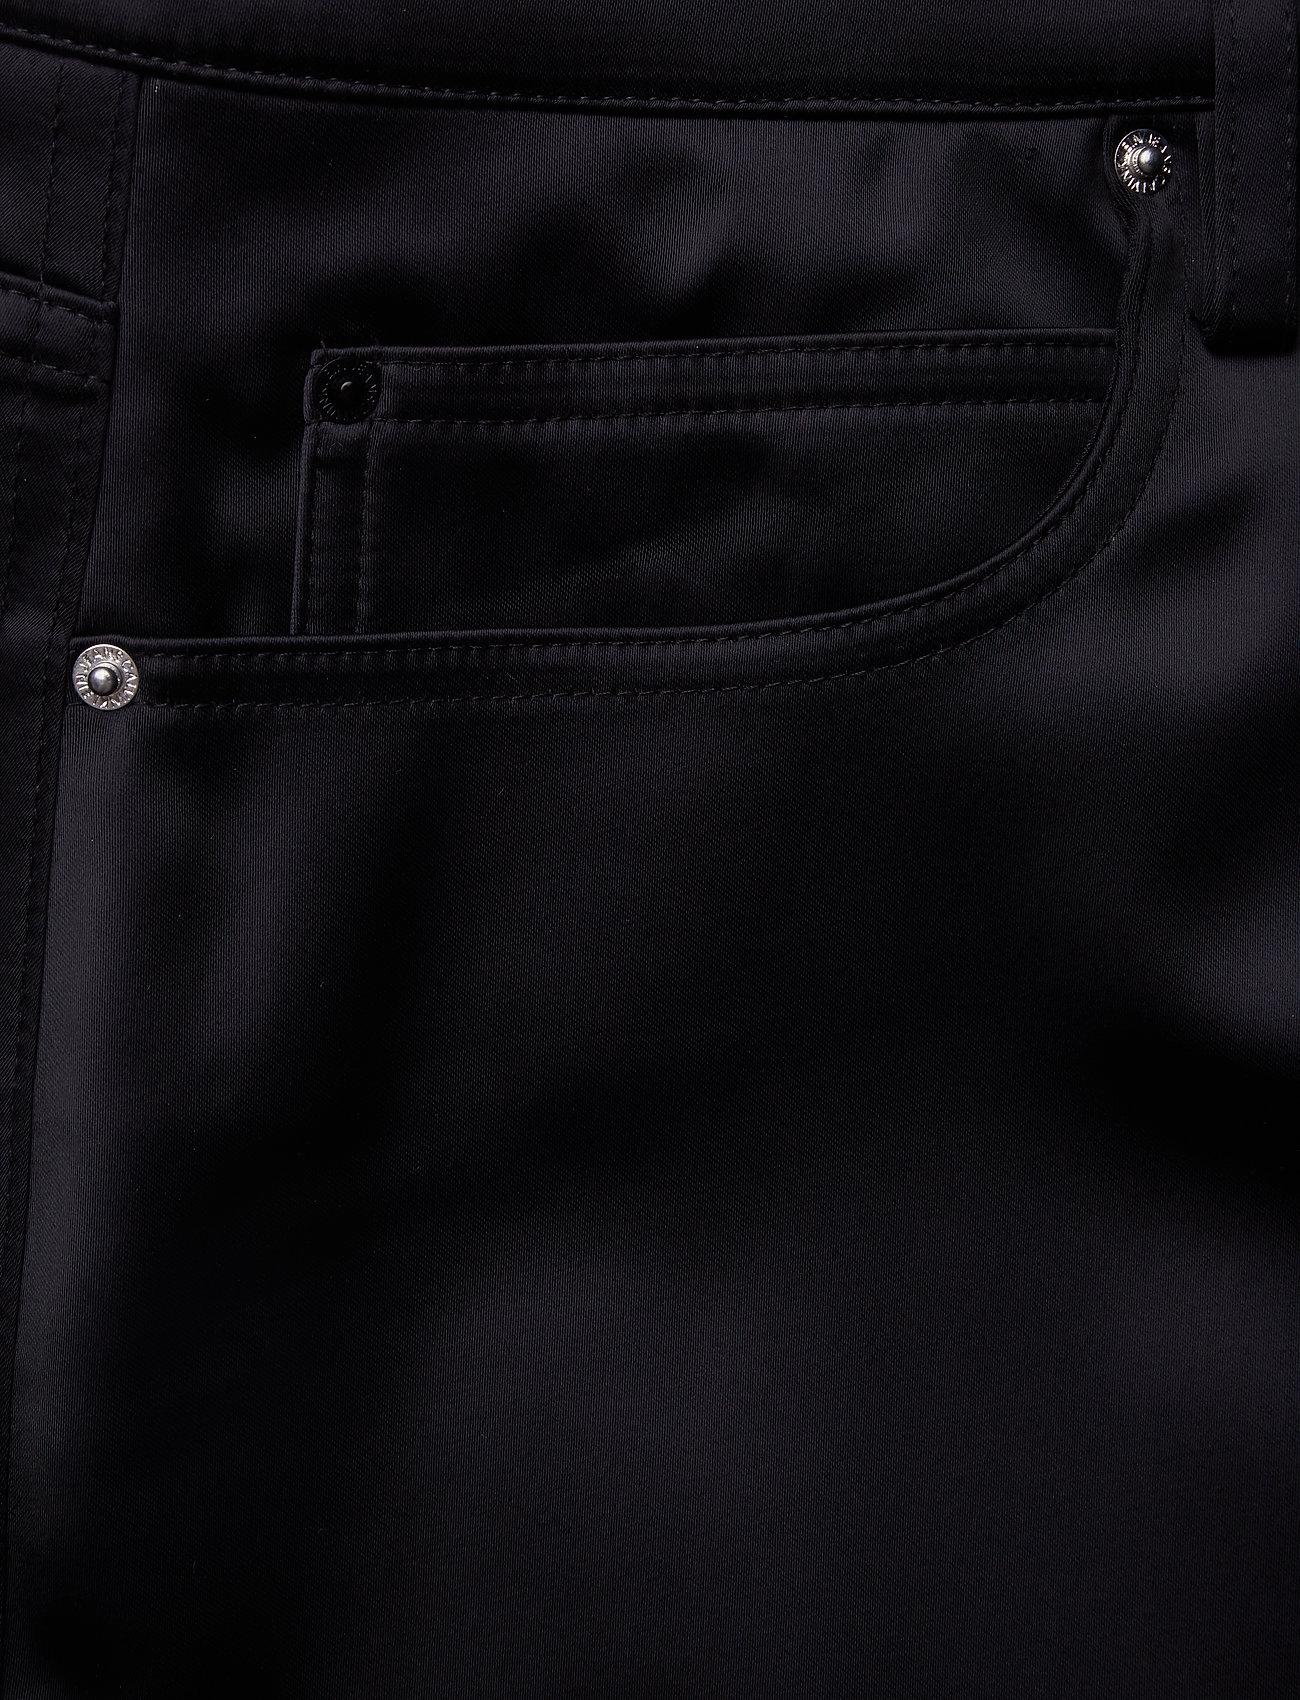 BlackCalvin 5pkt Jeans Mini Satin Klein Skirck oxWrdBQCe